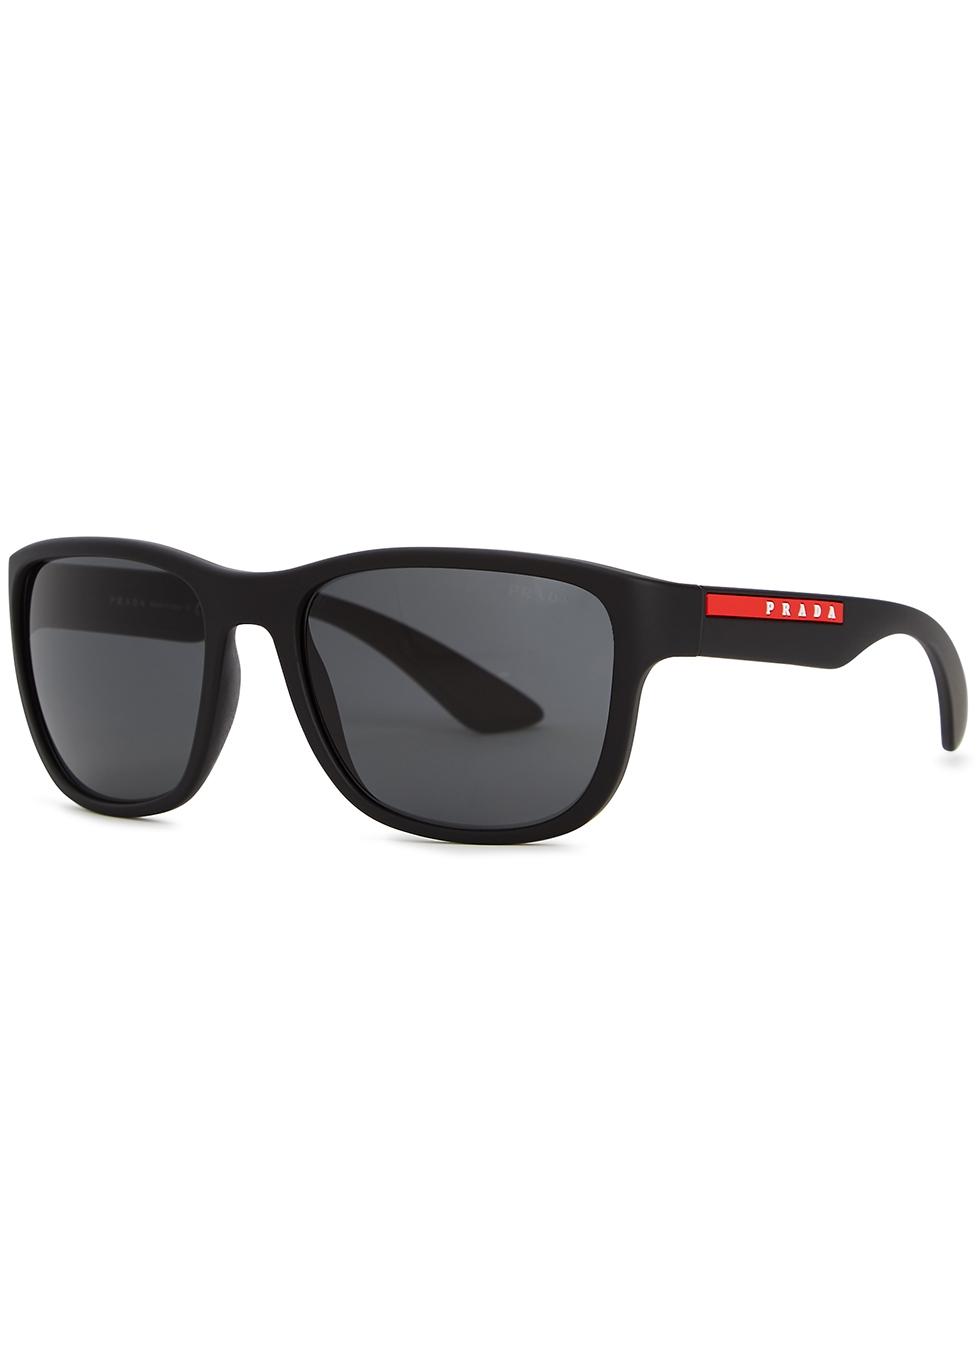 77ceaaa857d9 172.50 1f459 c6bba  czech linea rossa black square frame sunglasses. prada  linea rossa ea3cd db95b